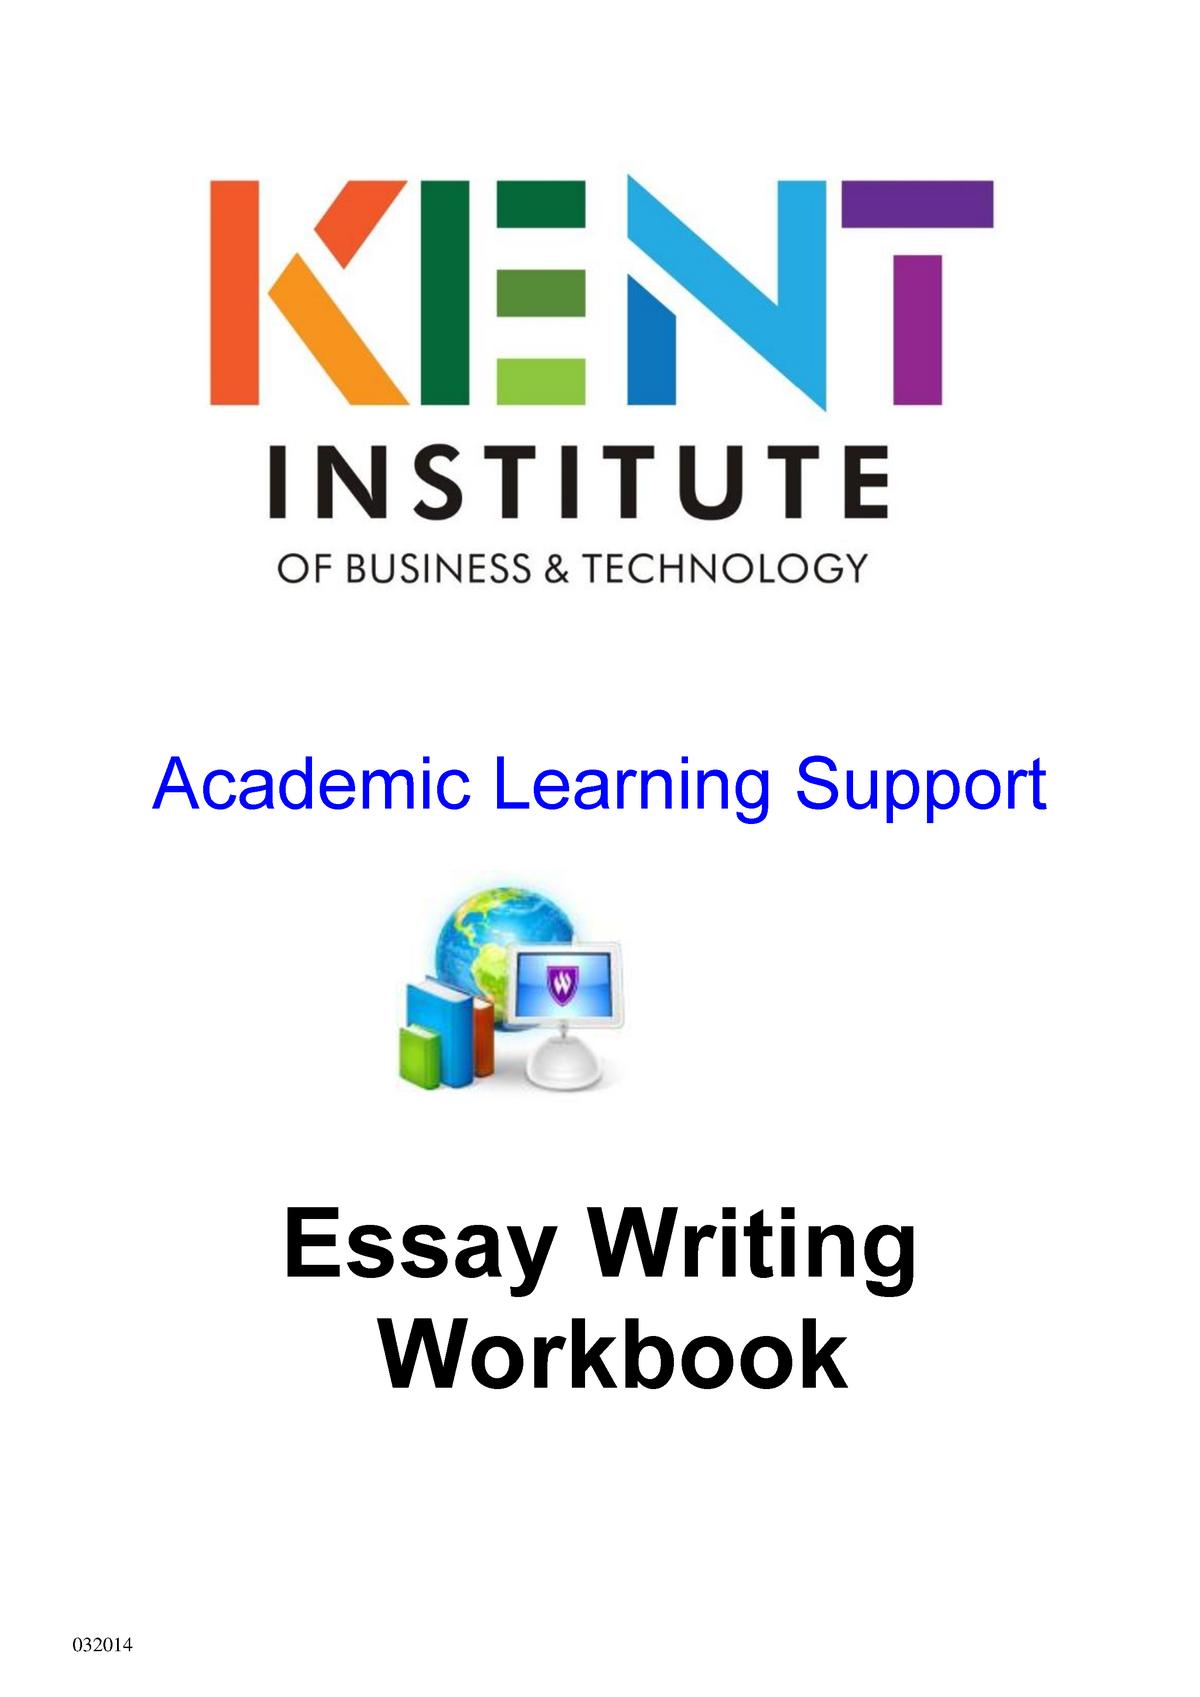 Essay writing workbook t1 2014 - EN593 - UKC - StuDocu